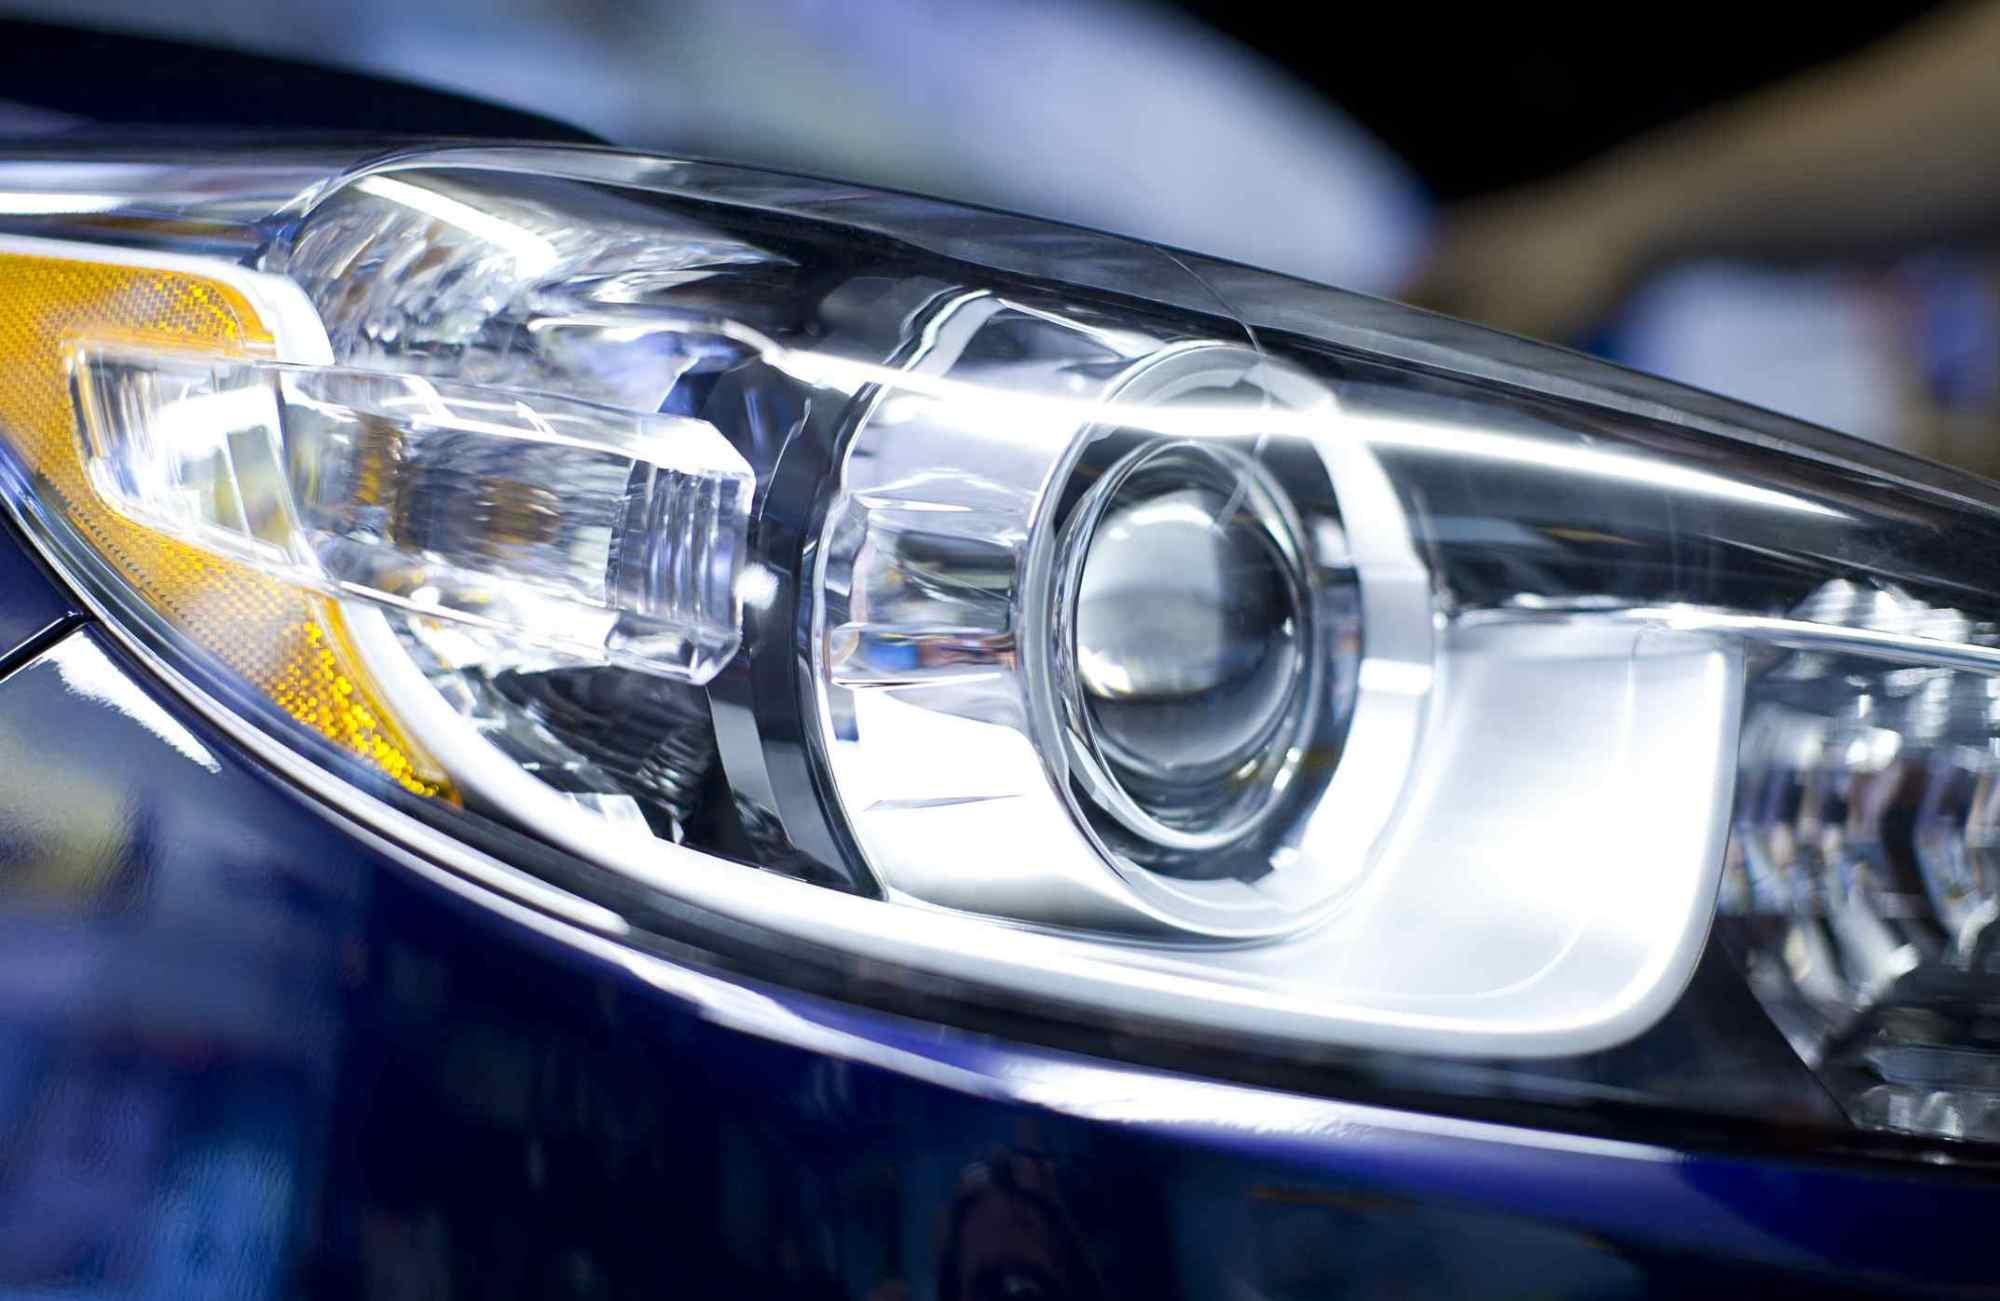 hight resolution of hid headlight closeup